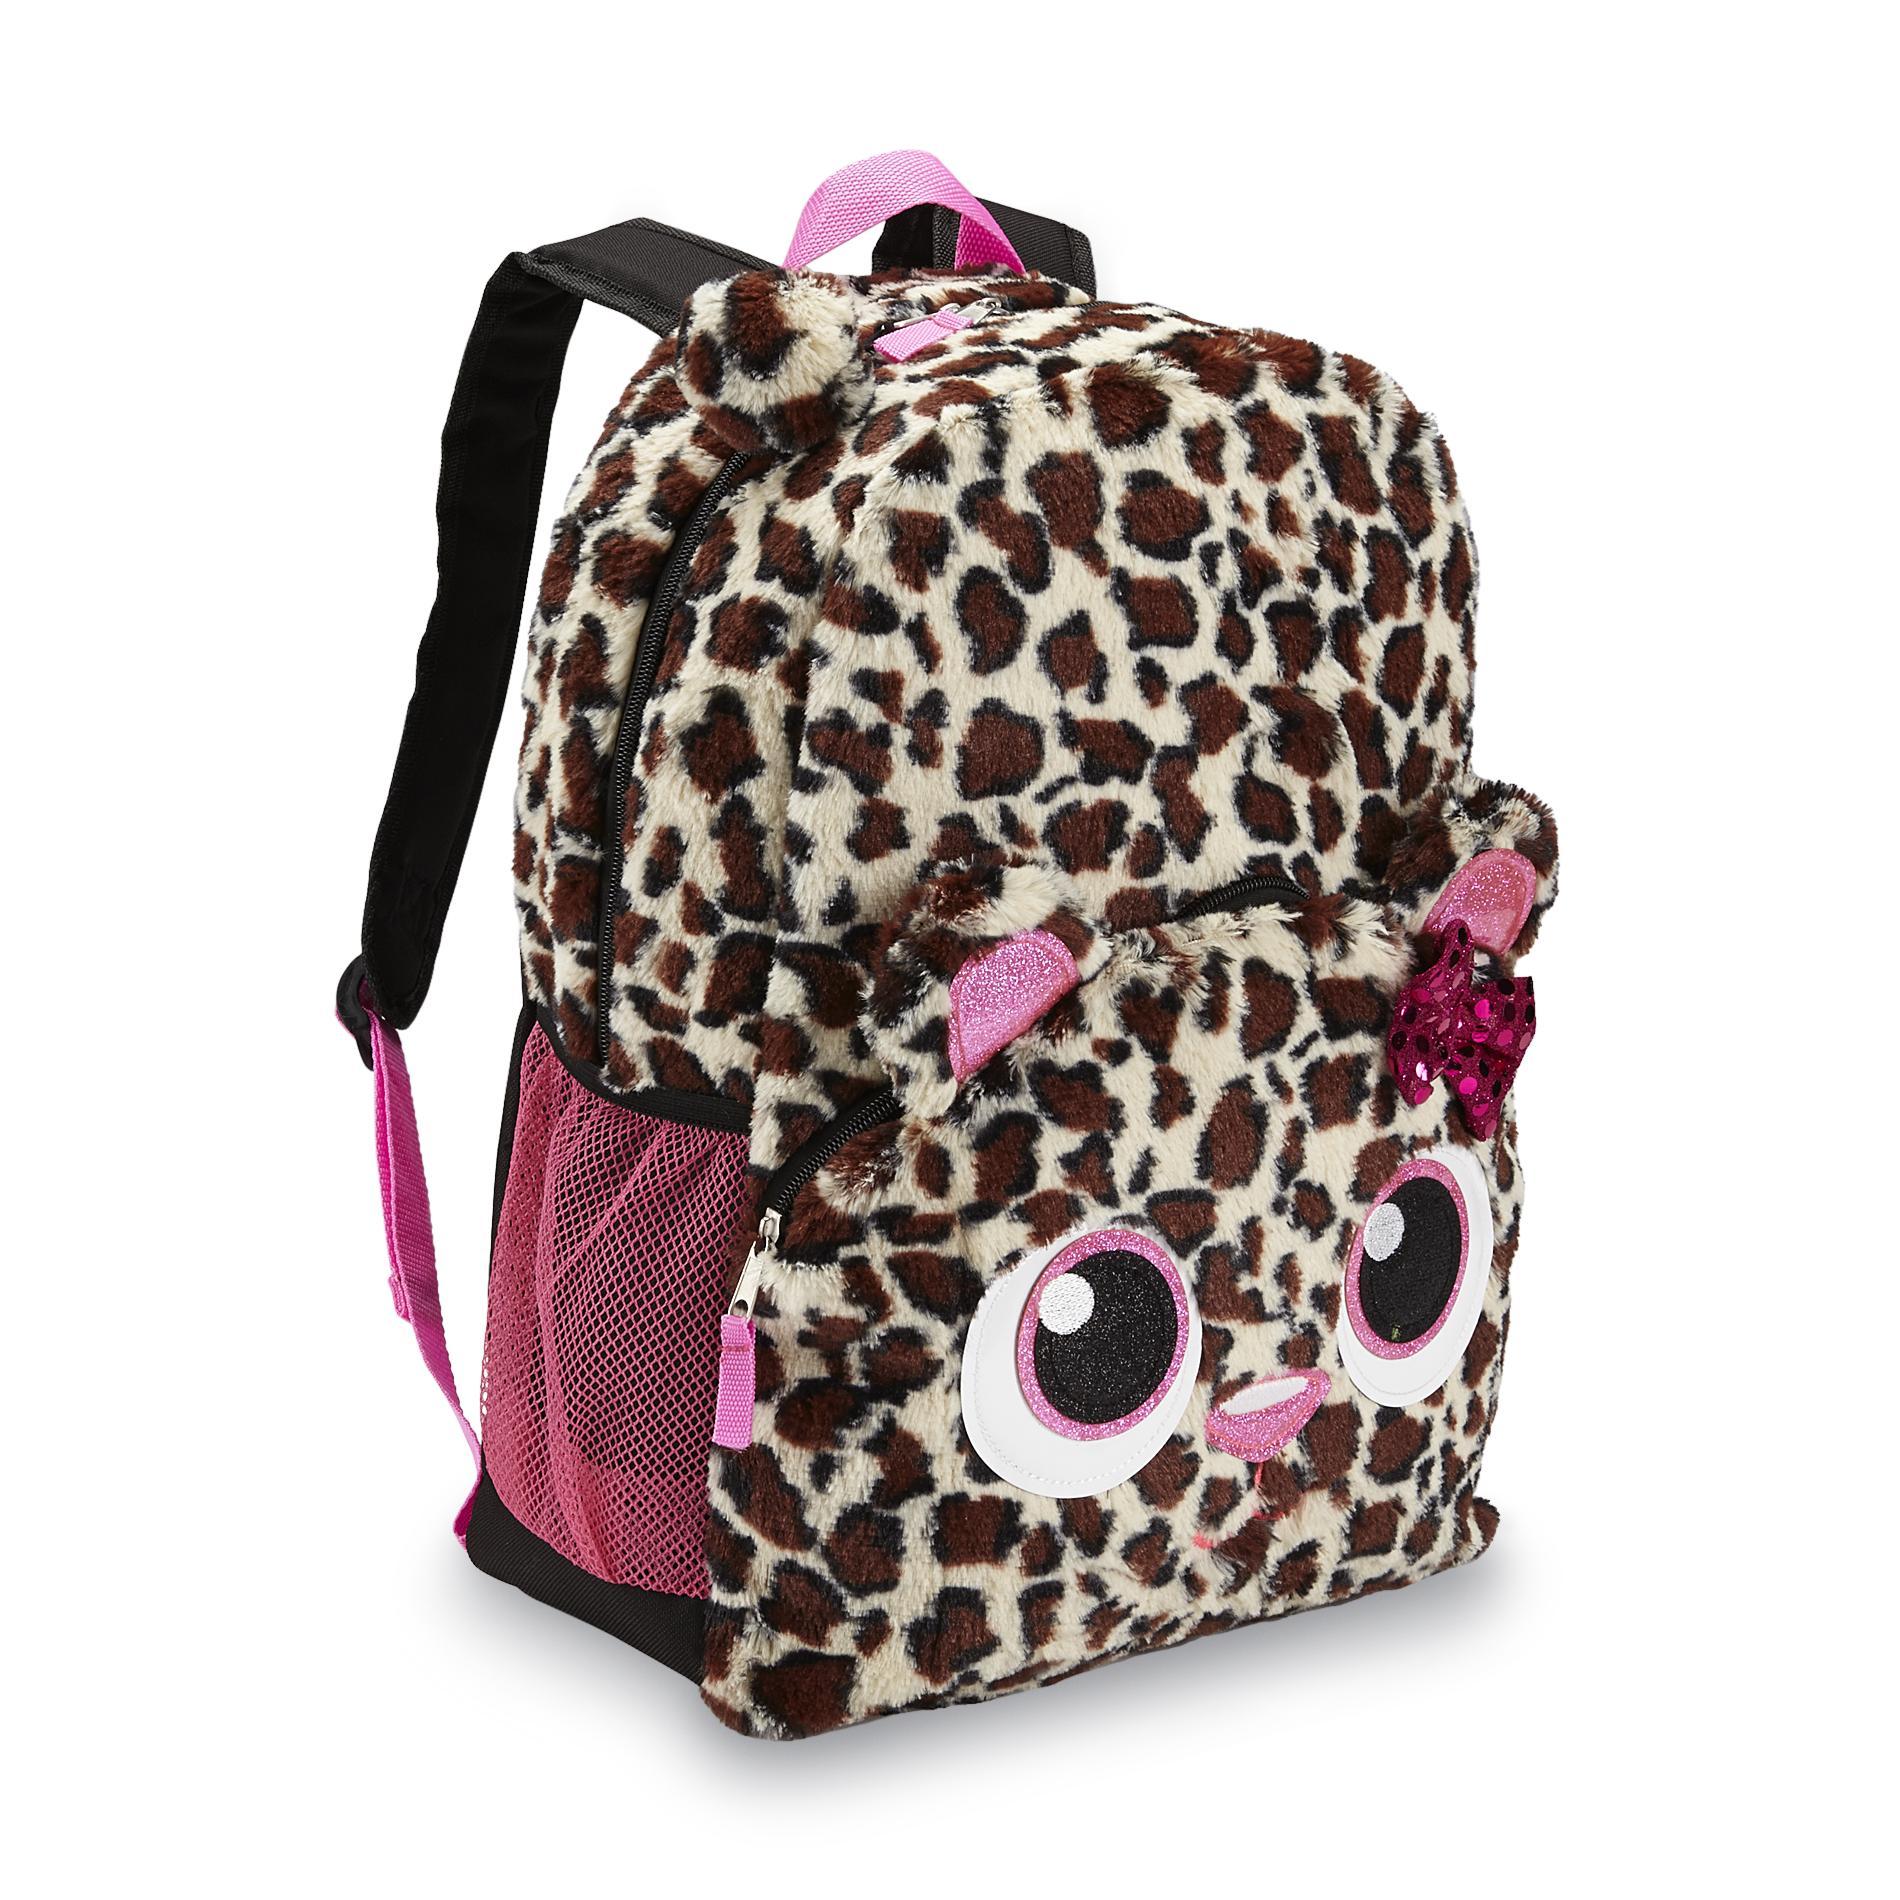 Girl's Faux Fur Embellished Backpack - Cheetah